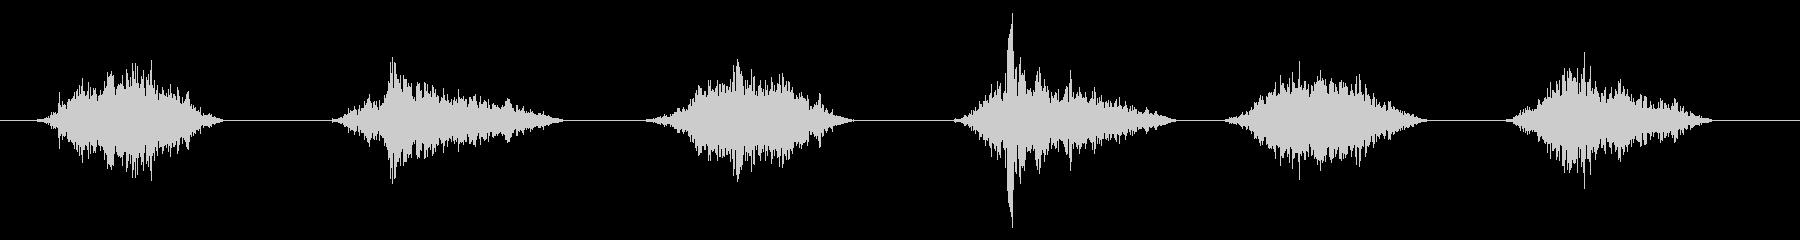 PC マウス ムーブ03-02(木)の未再生の波形